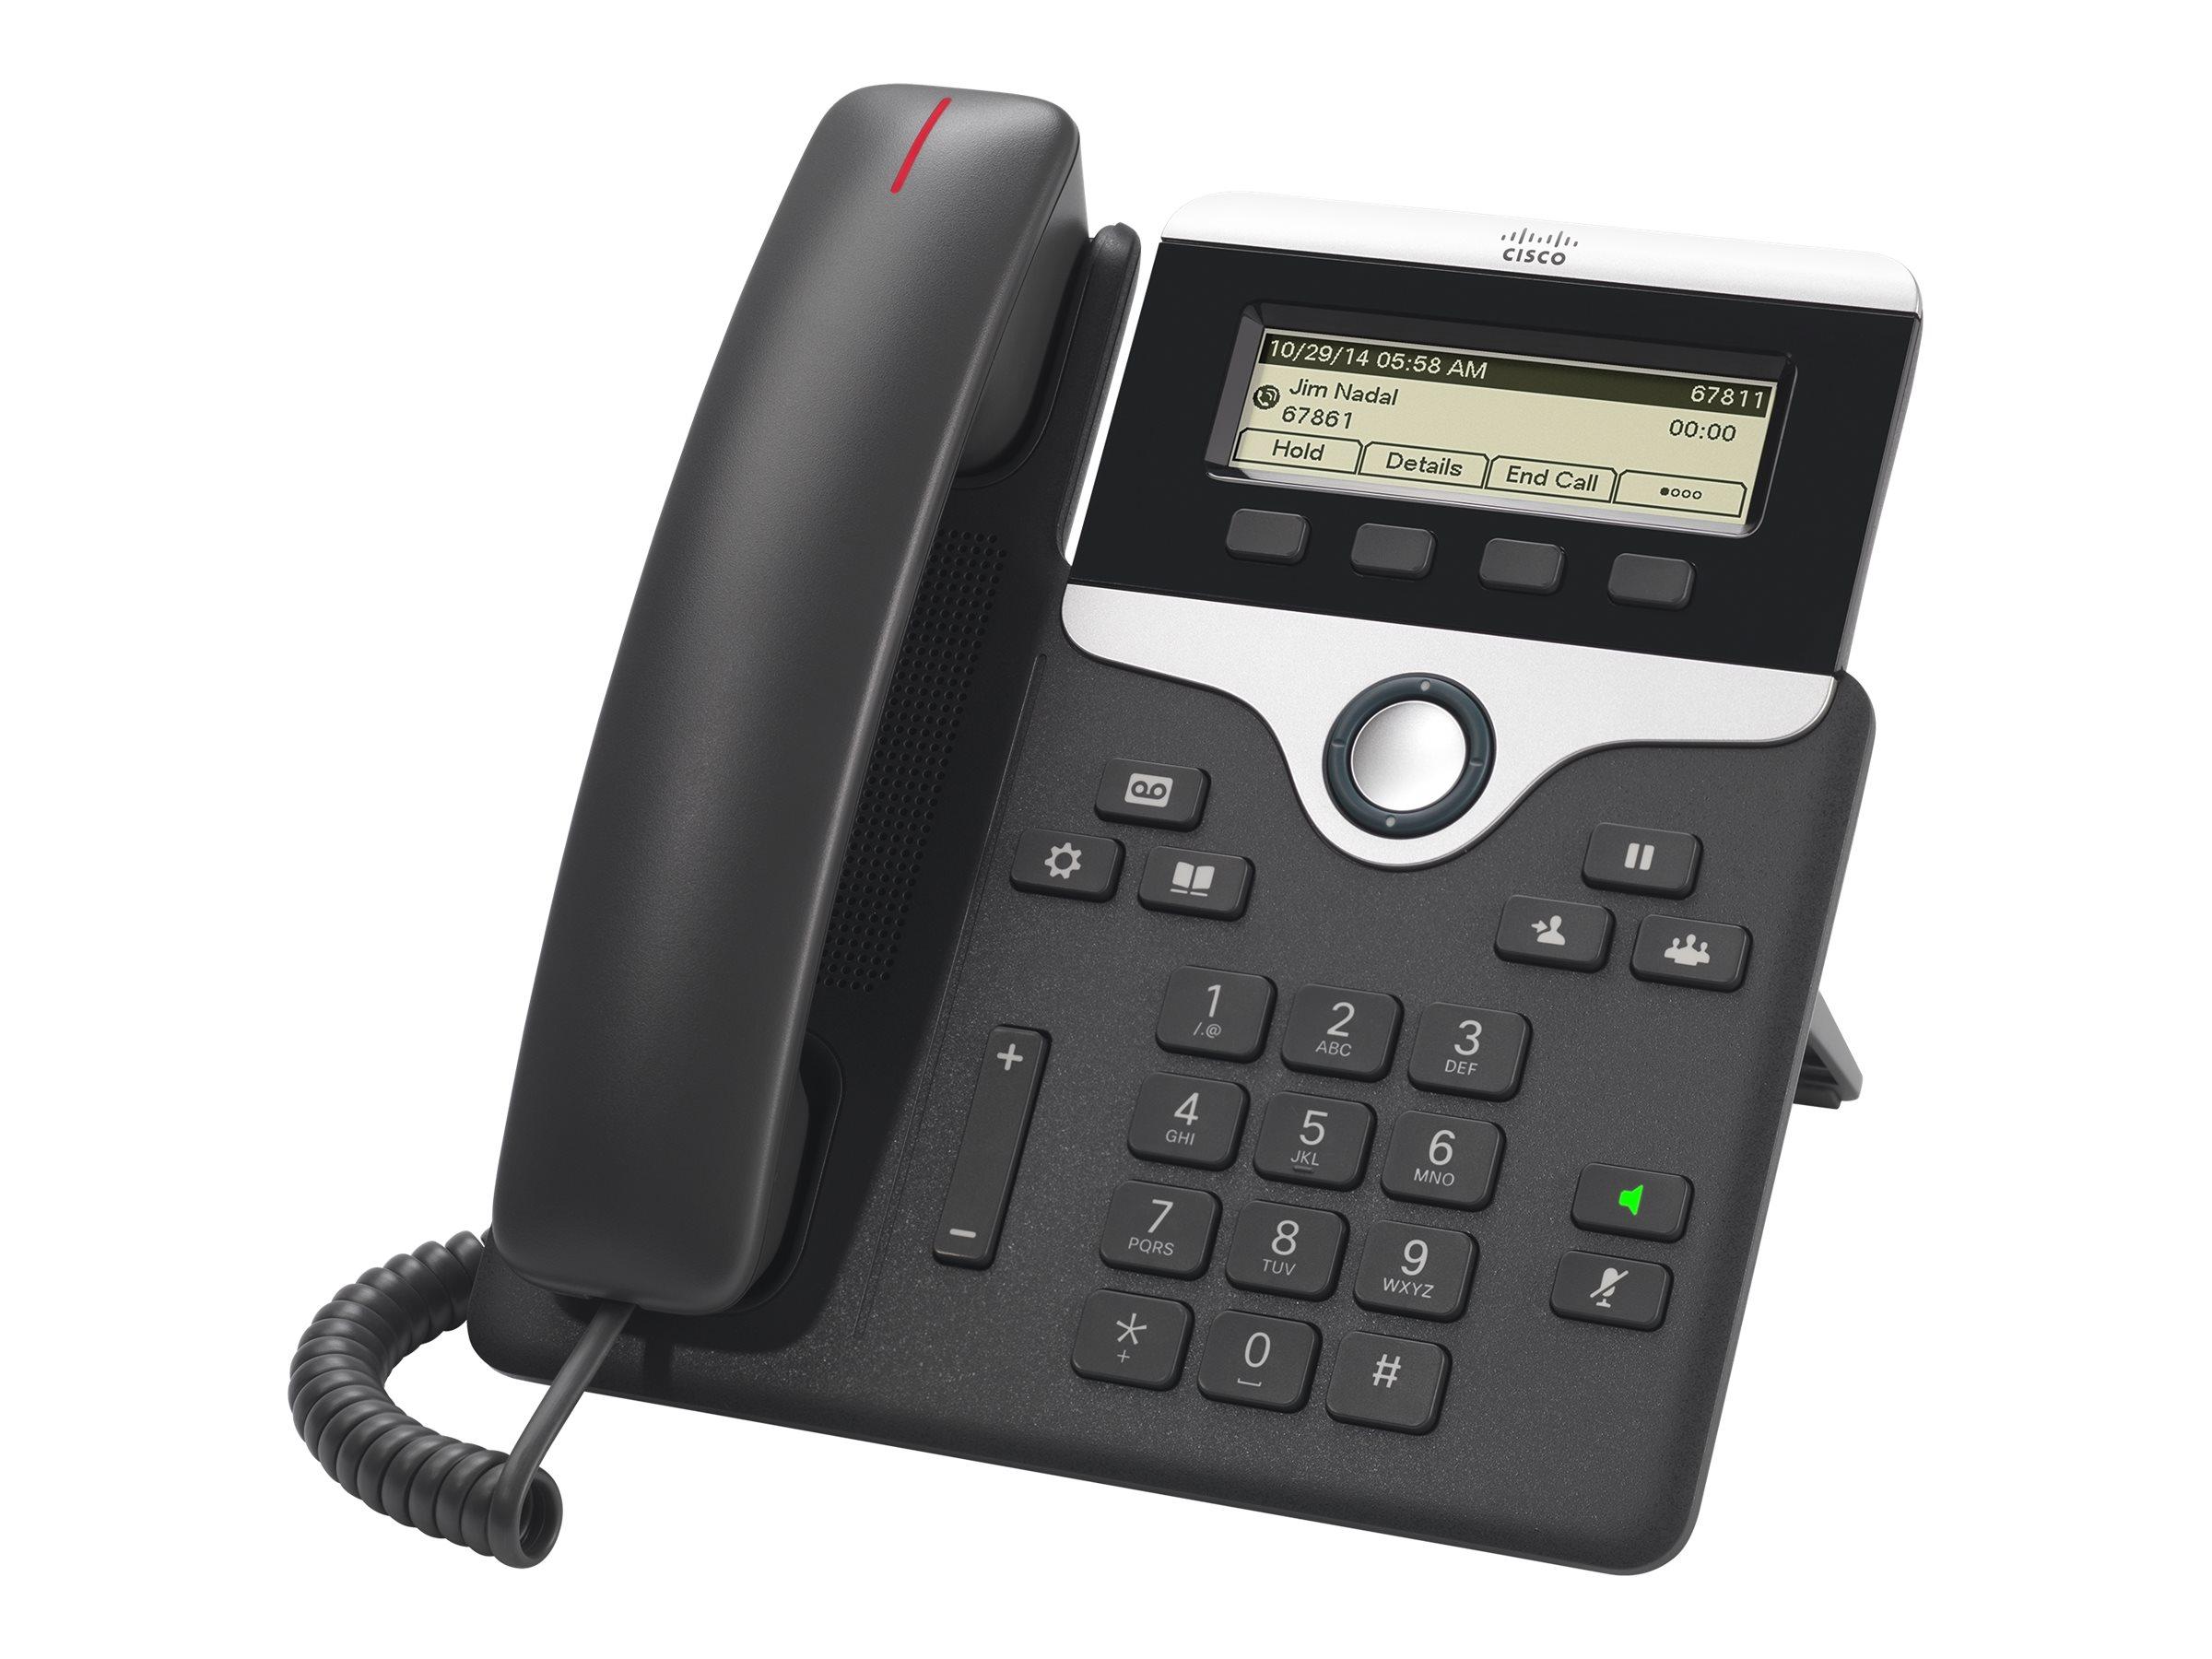 Cisco IP Phone 7811 - VoIP-Telefon - SIP, SRTP